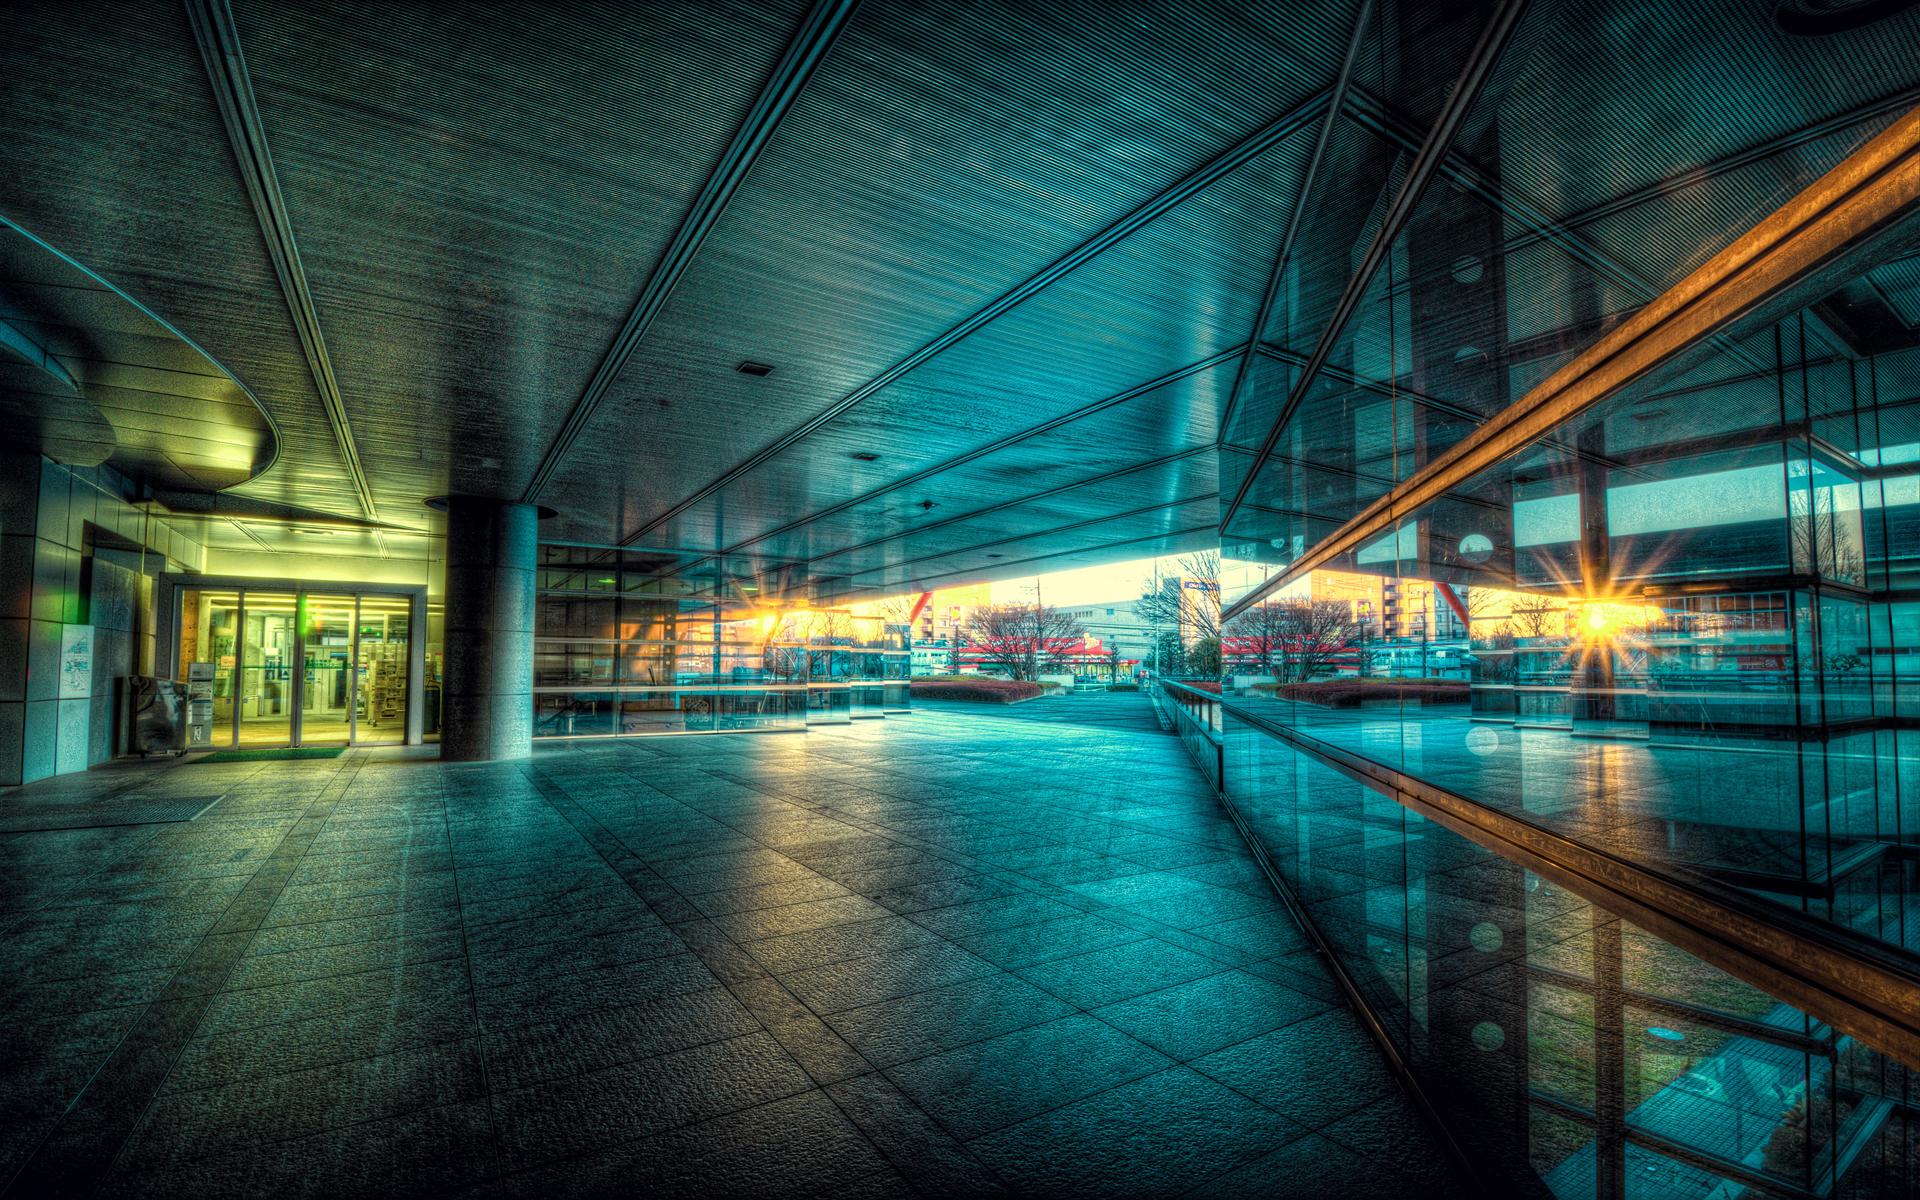 Urban Sunset II | P I C T U R I Z E